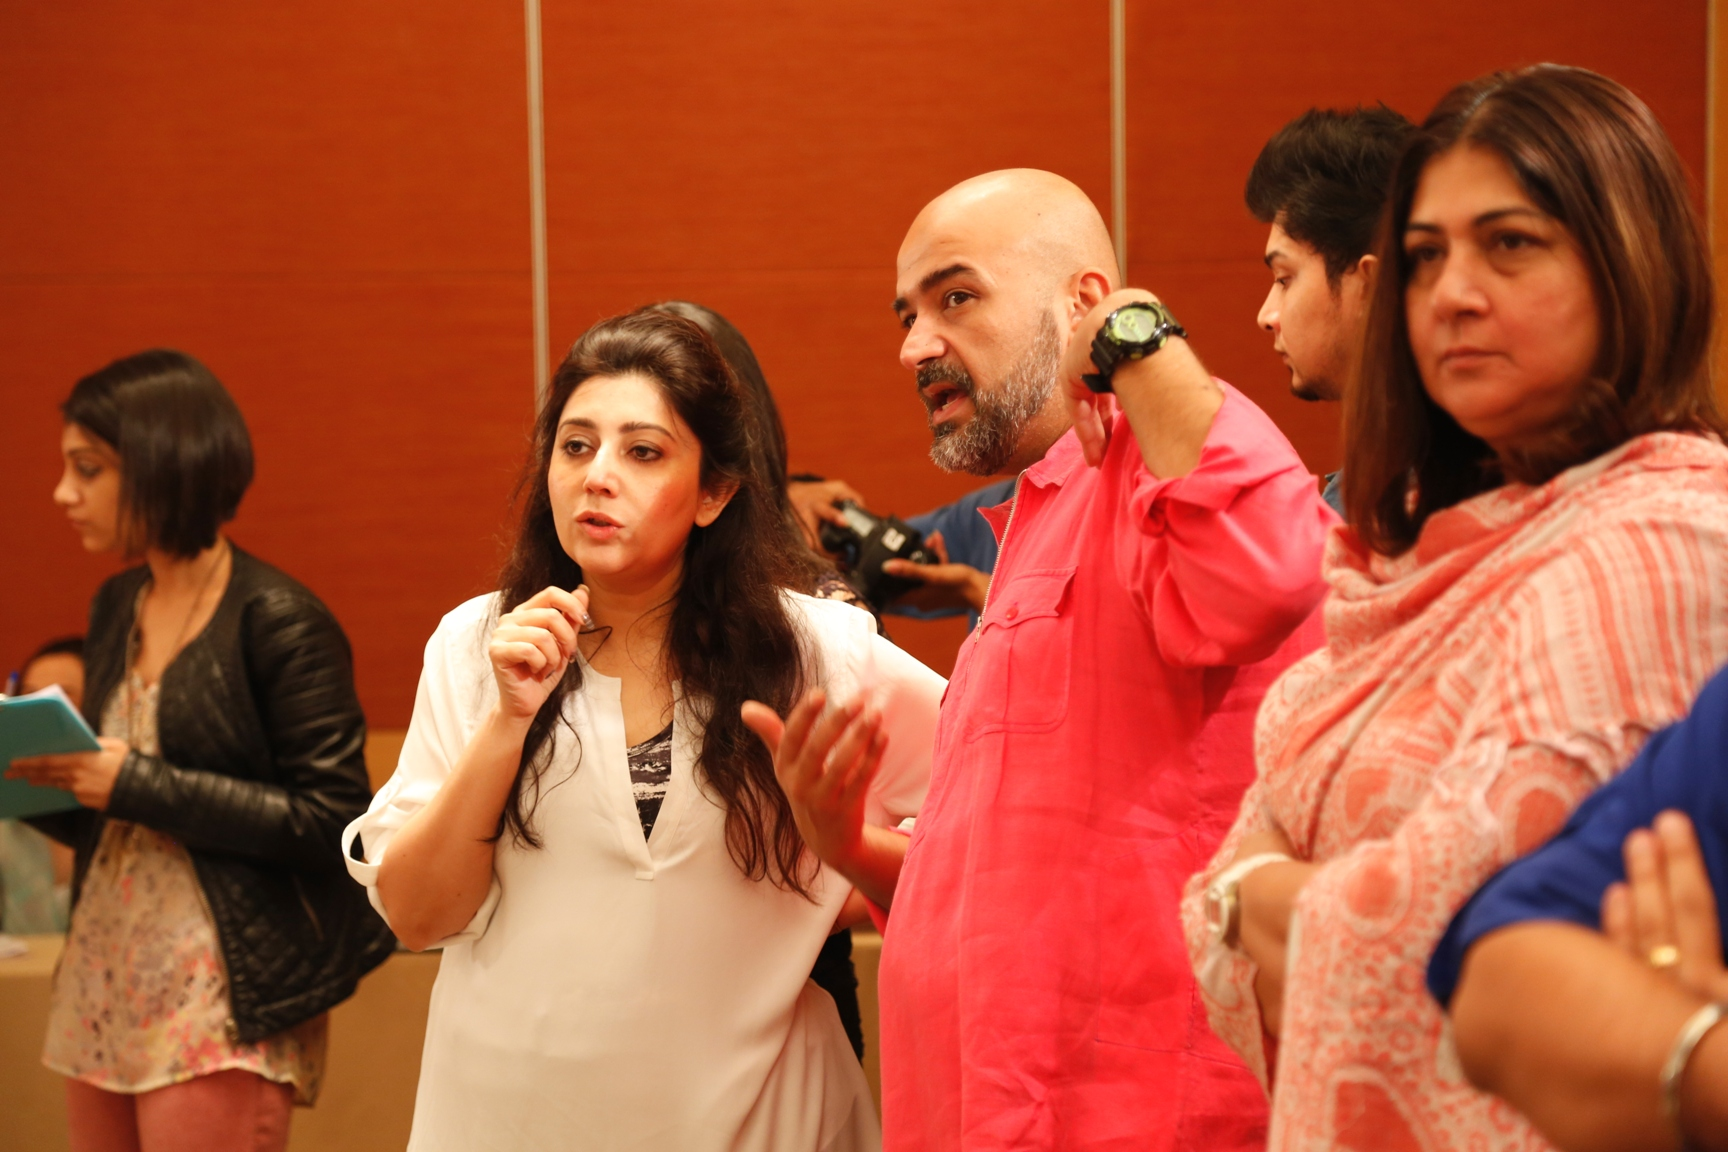 LFW SR 2014 - Day 2 Fittings (2) - Archana Kochhar